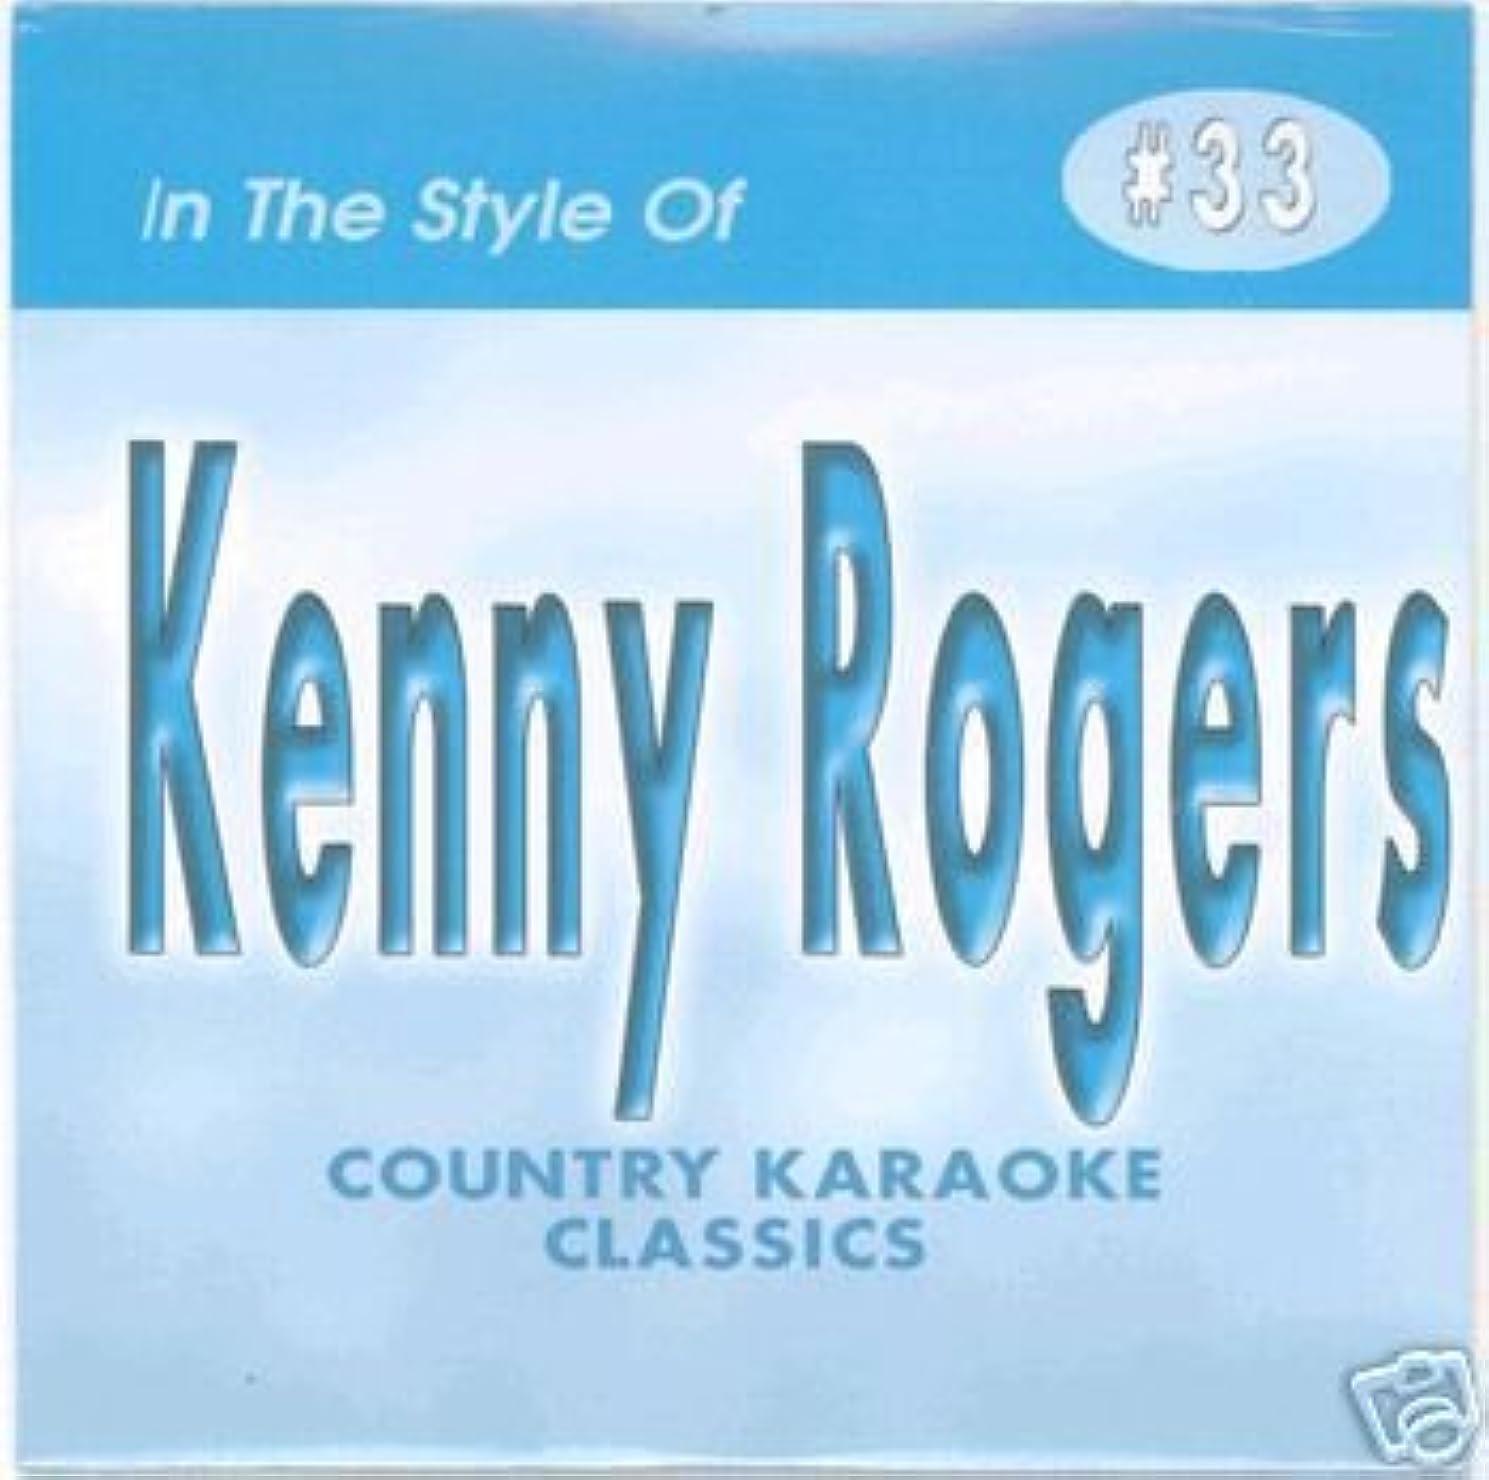 KENNY ROGERS #1 Country Karaoke Classics CDG Music CD